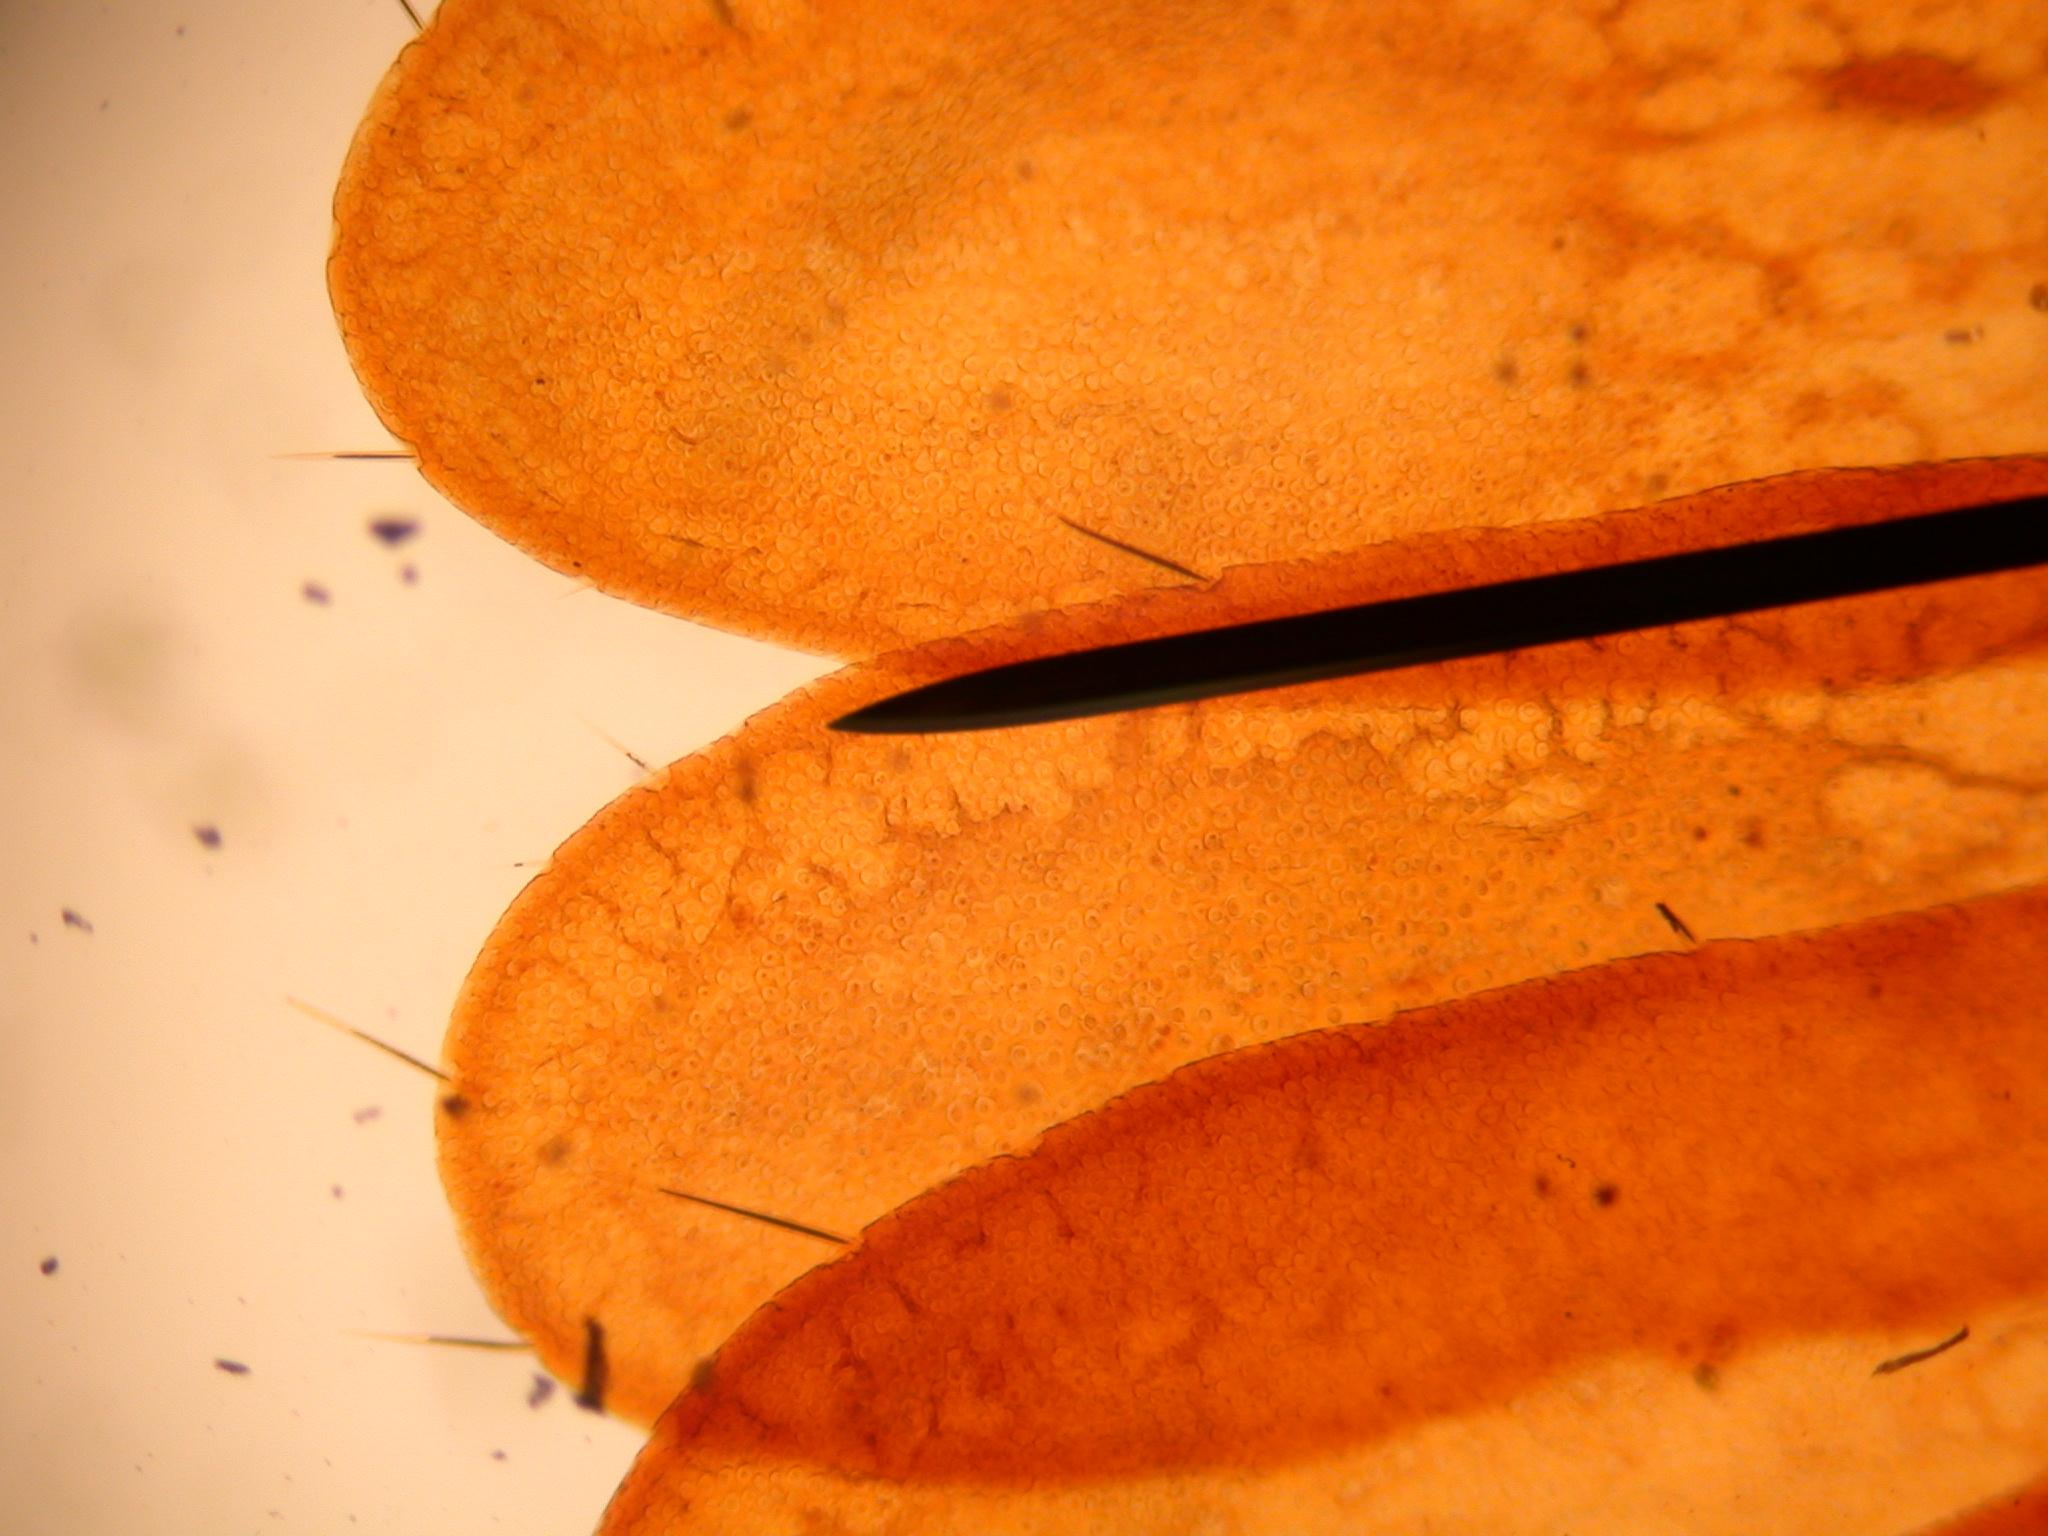 microscopic texture good orange cell cells organism orange